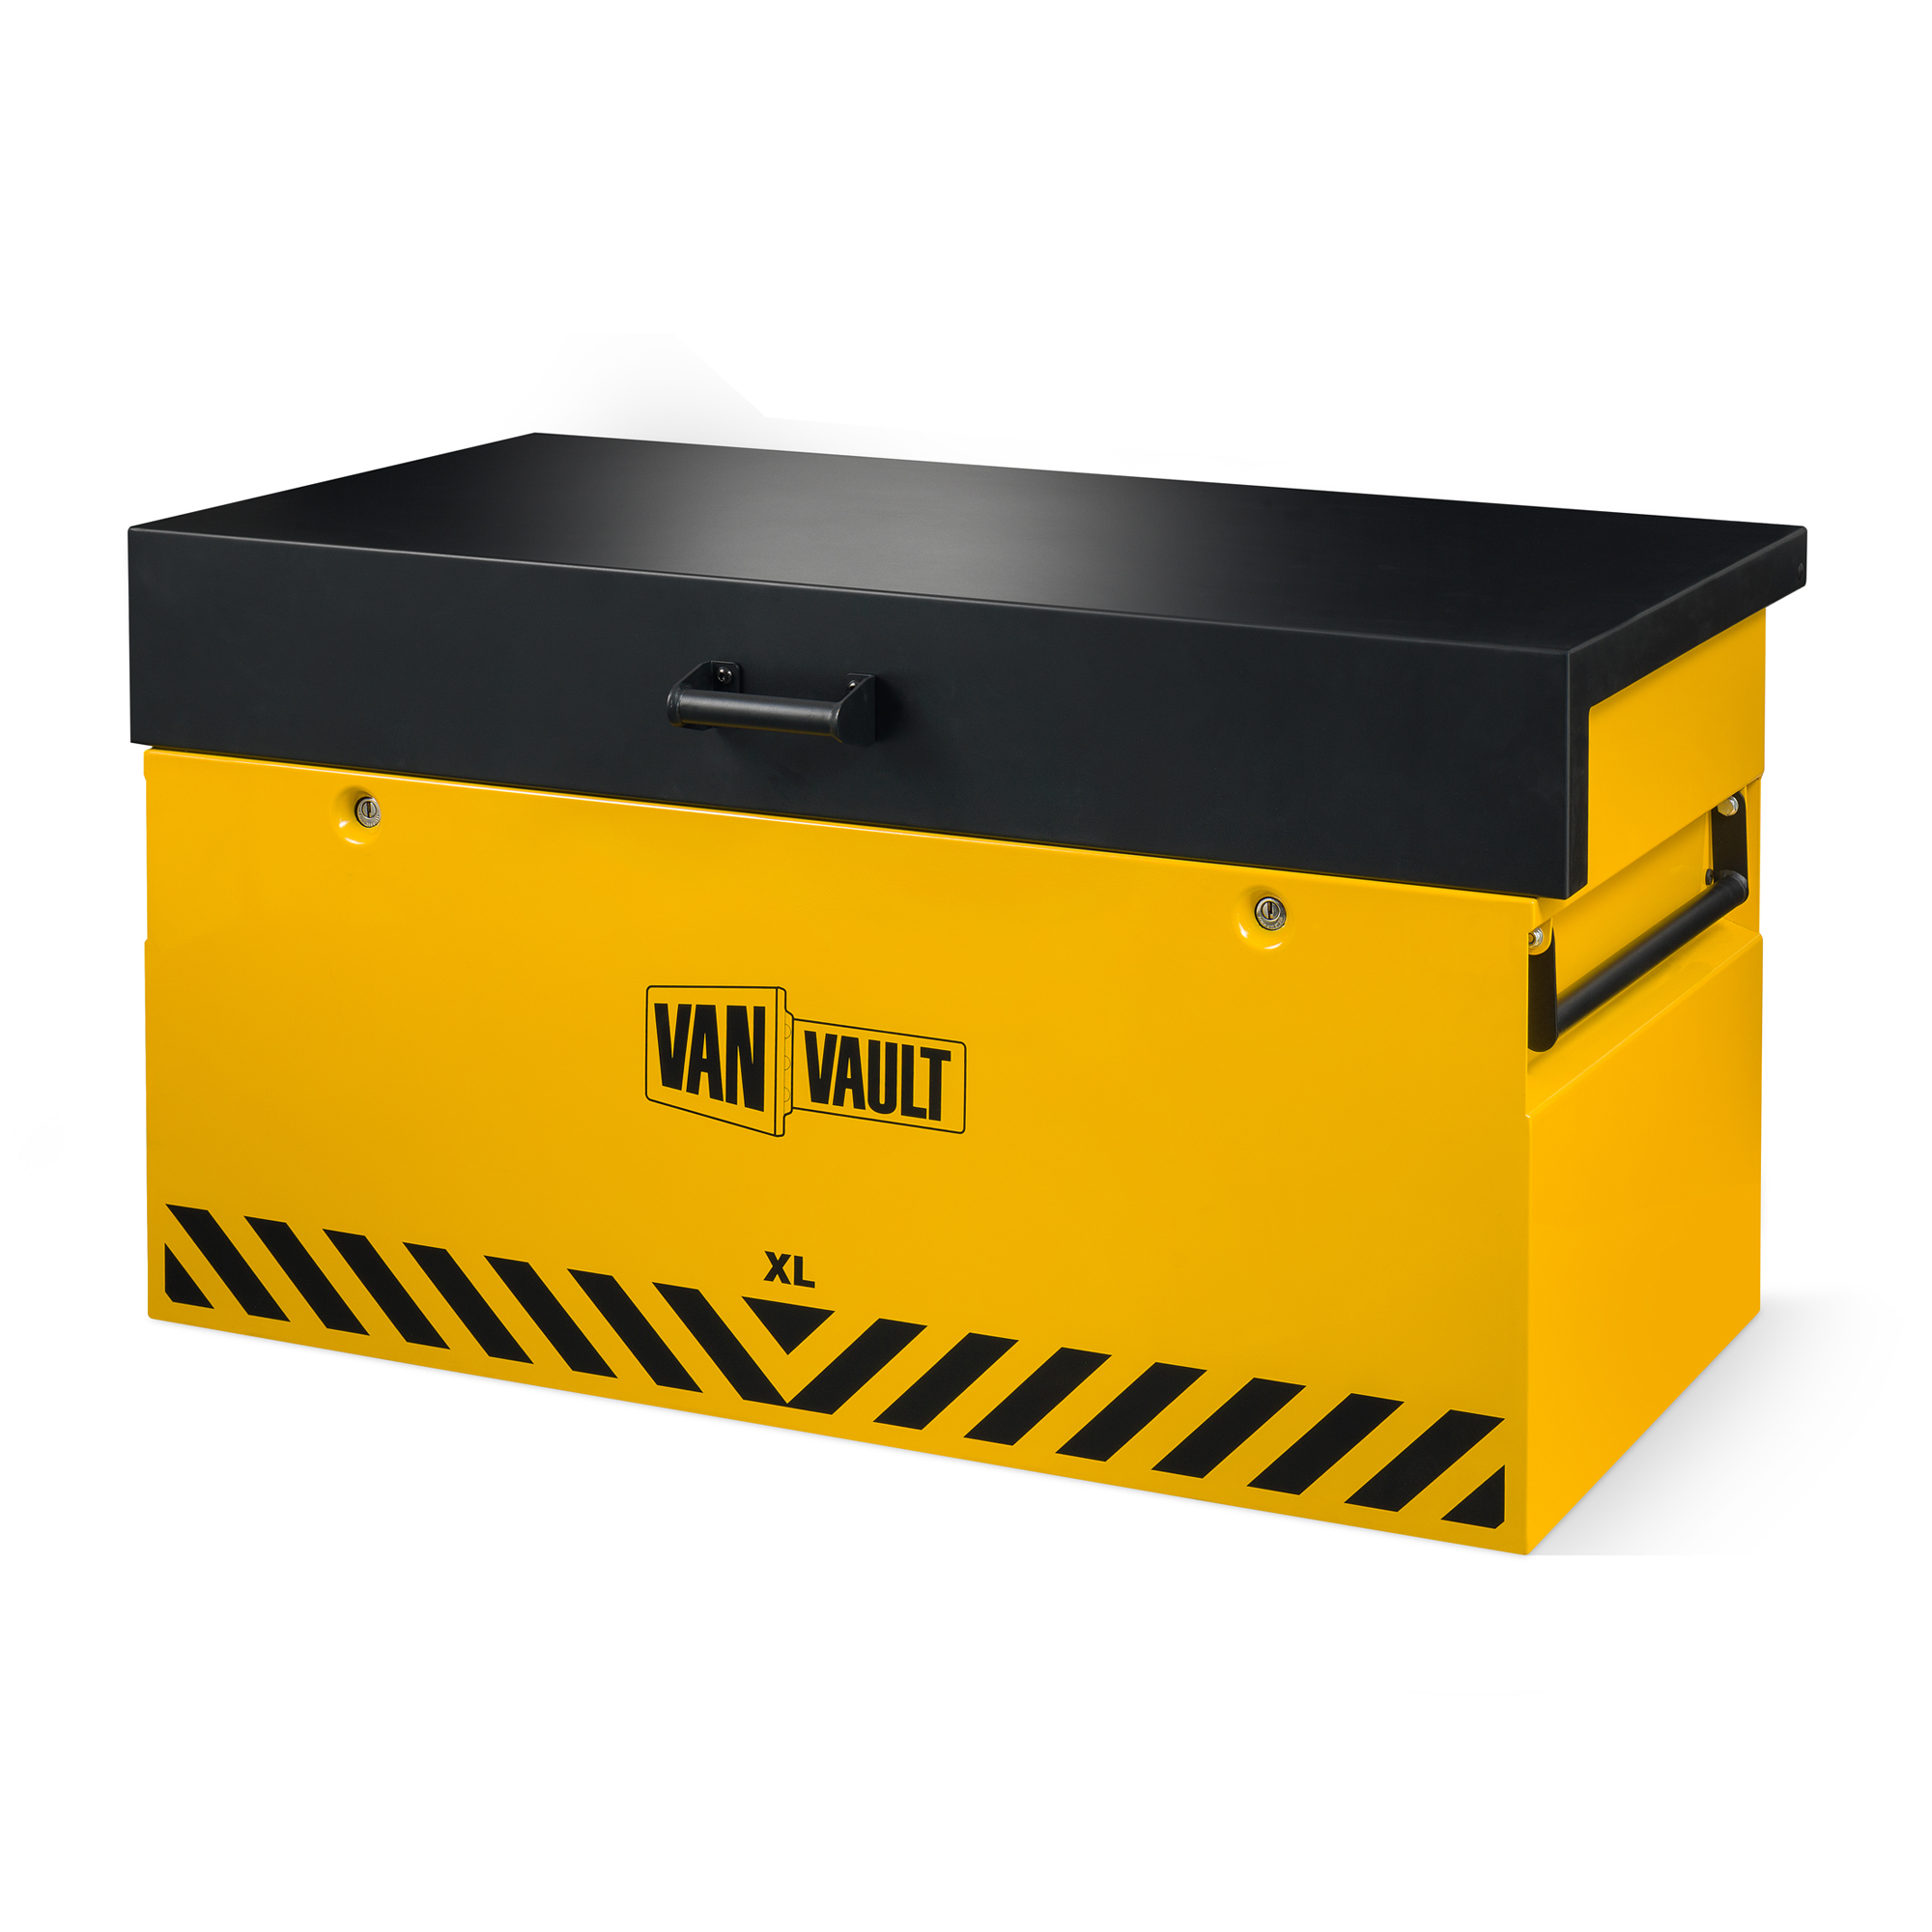 new van vault xl with lid securely down